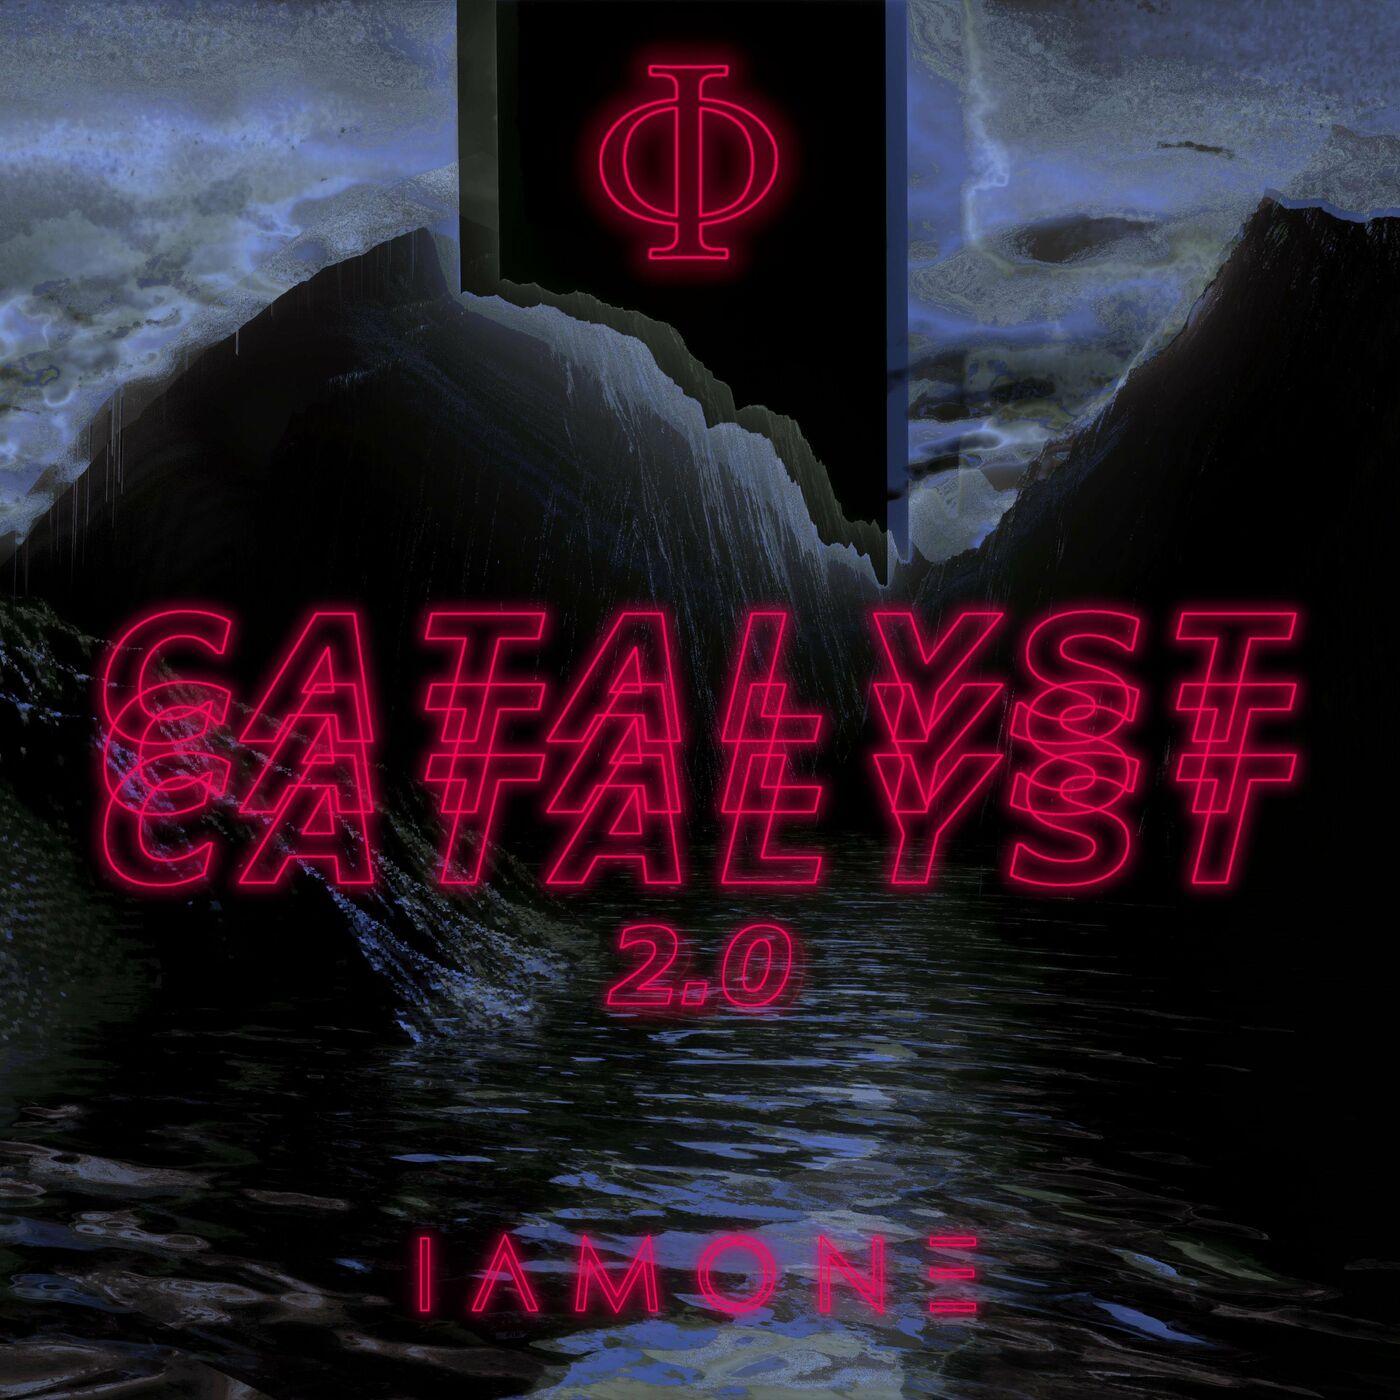 IAMONE - Catalyst 2.0 [single] (2020)